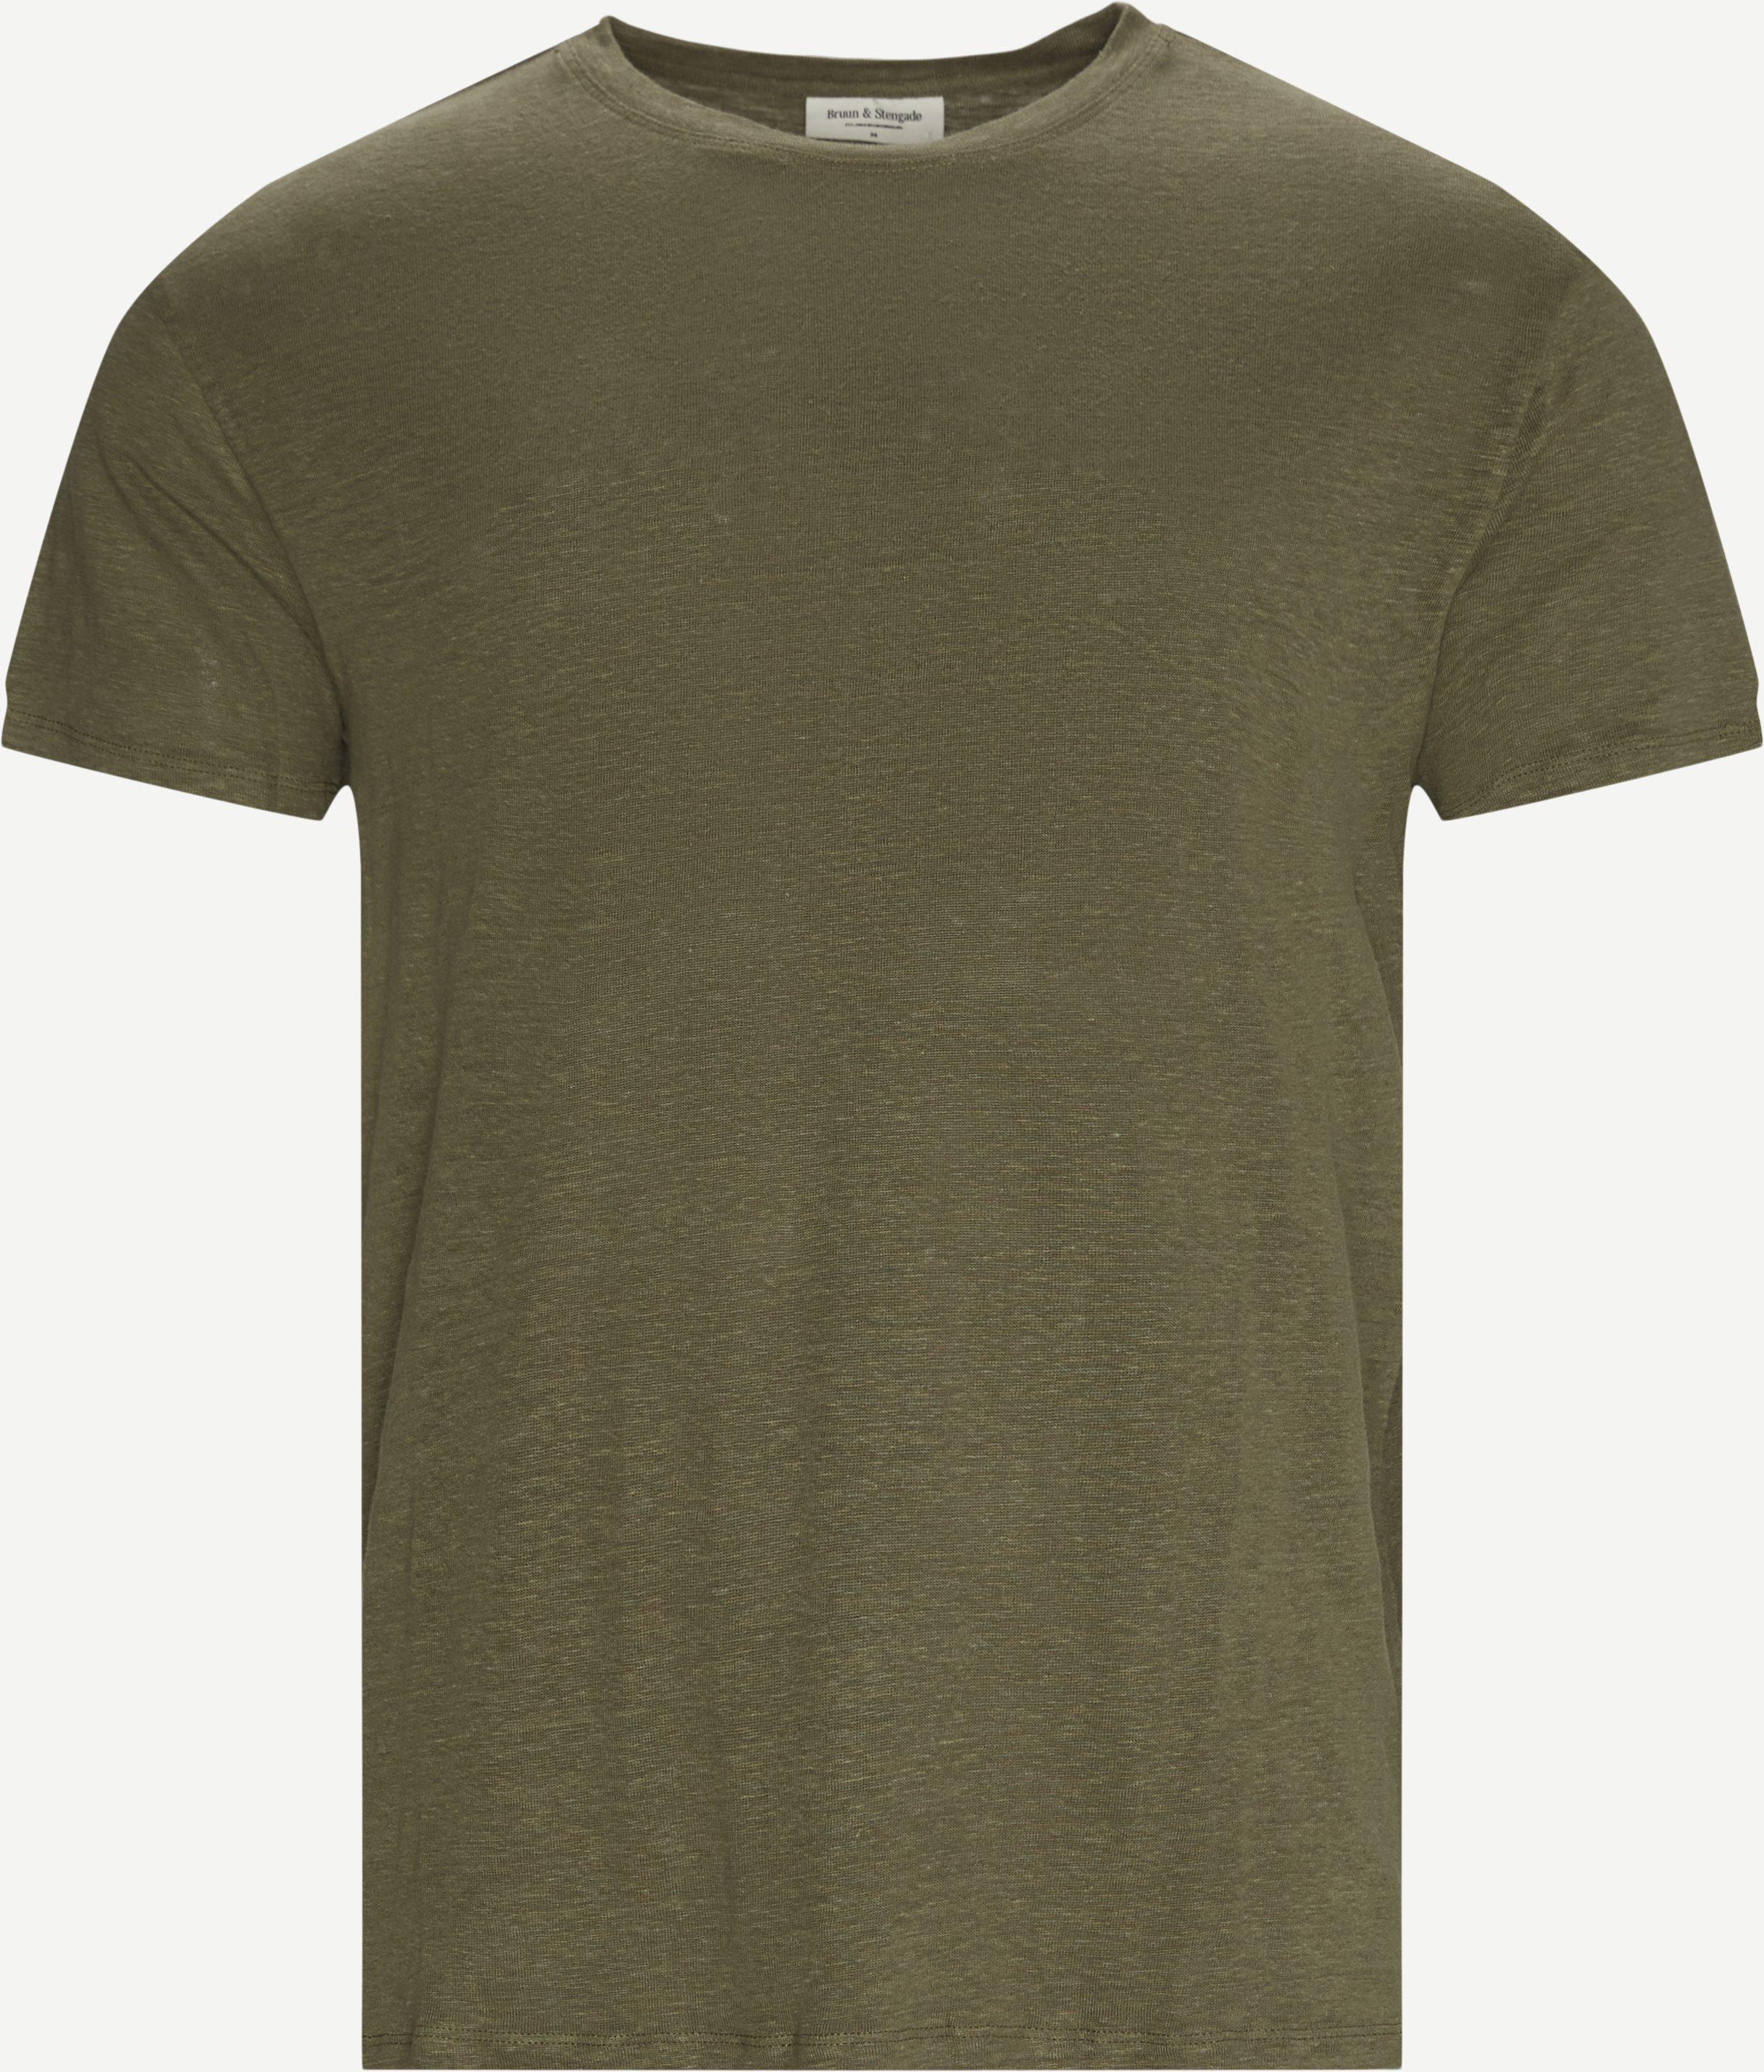 Palermo T-shirt - T-shirts - Regular - Army